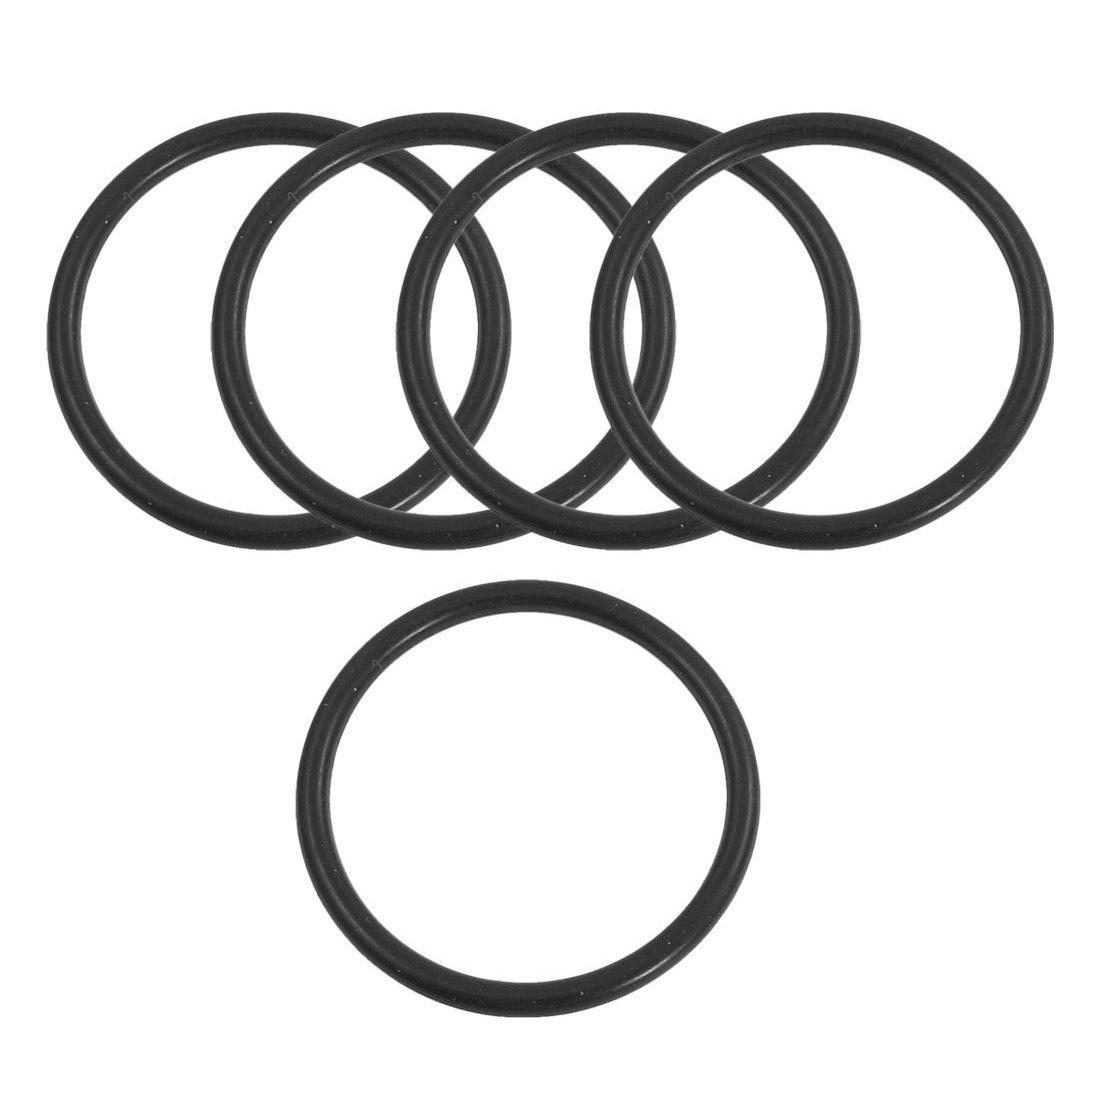 TOOGOO Nitrilkautschuk Dichtungen 160 mm x 5 mm Industrie Flexible Gummi-O-Ring-Dichtung Waschmaschine R